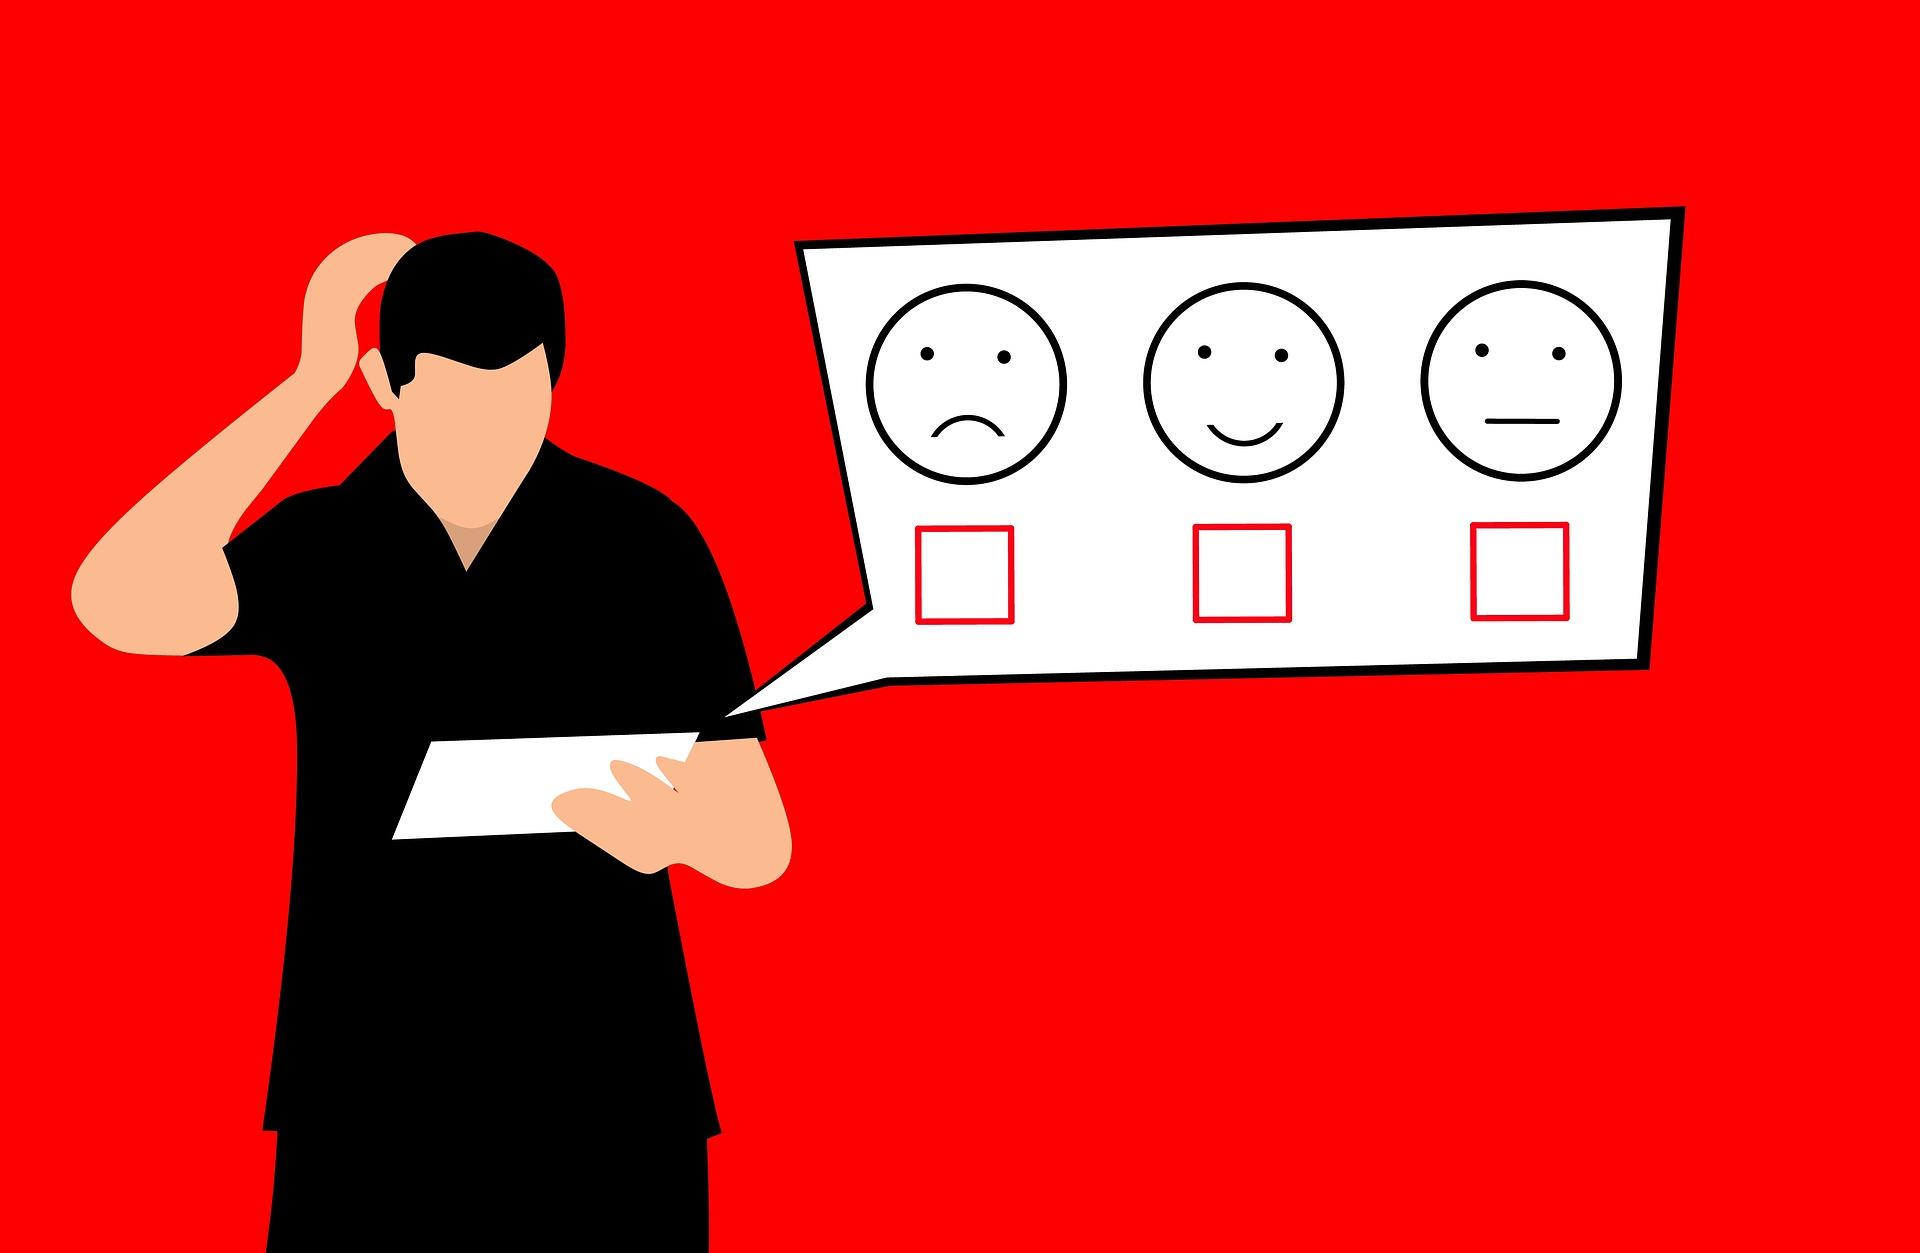 Vlaicu Online Store Review - is it Trustworthy?